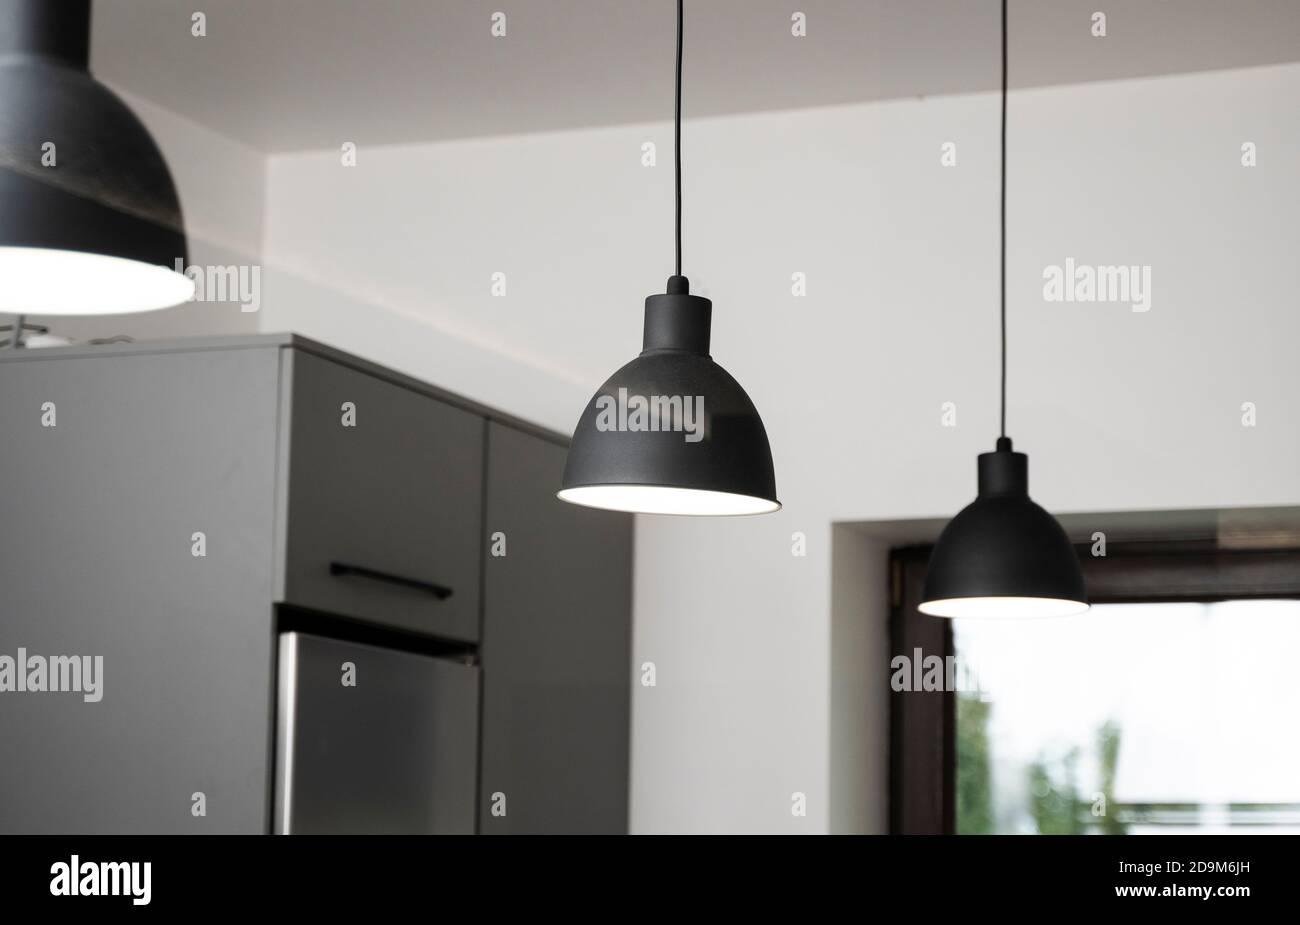 Industrial Black Look Pendant Lamps In A Kitchen Interior Modern Loft Interior Design Stock Photo Alamy